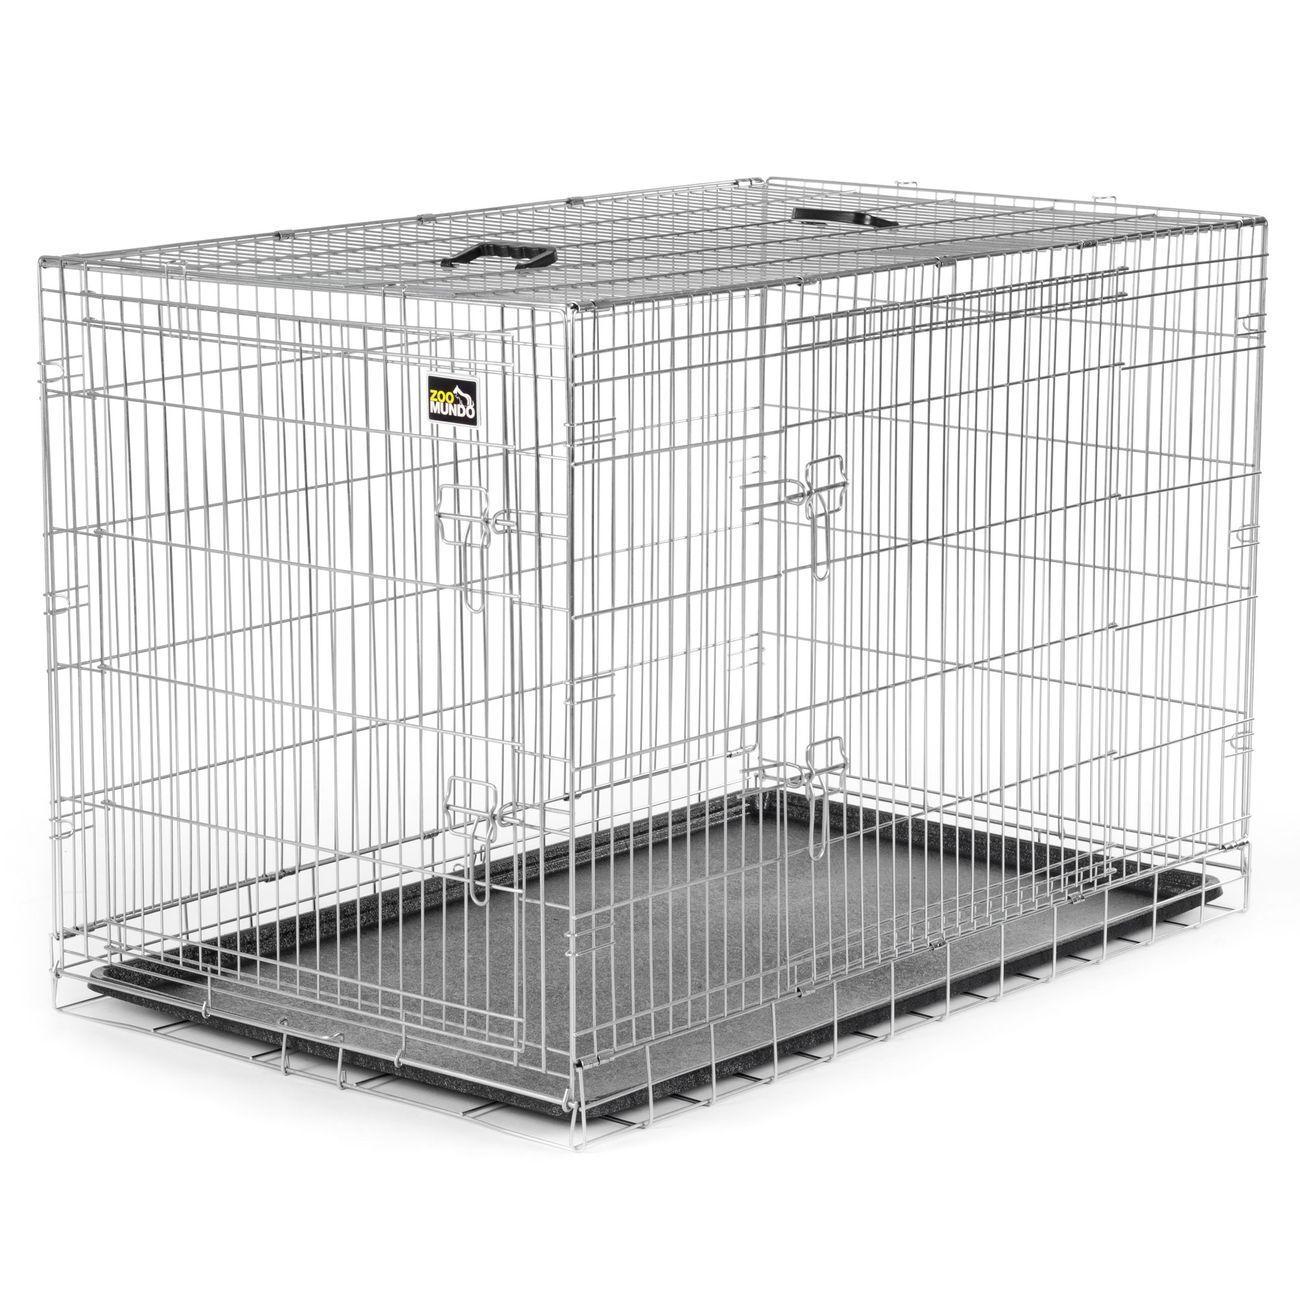 Jaula para Mascotas para Perros Gatos Plegable Transporte de Animales Metal XXL